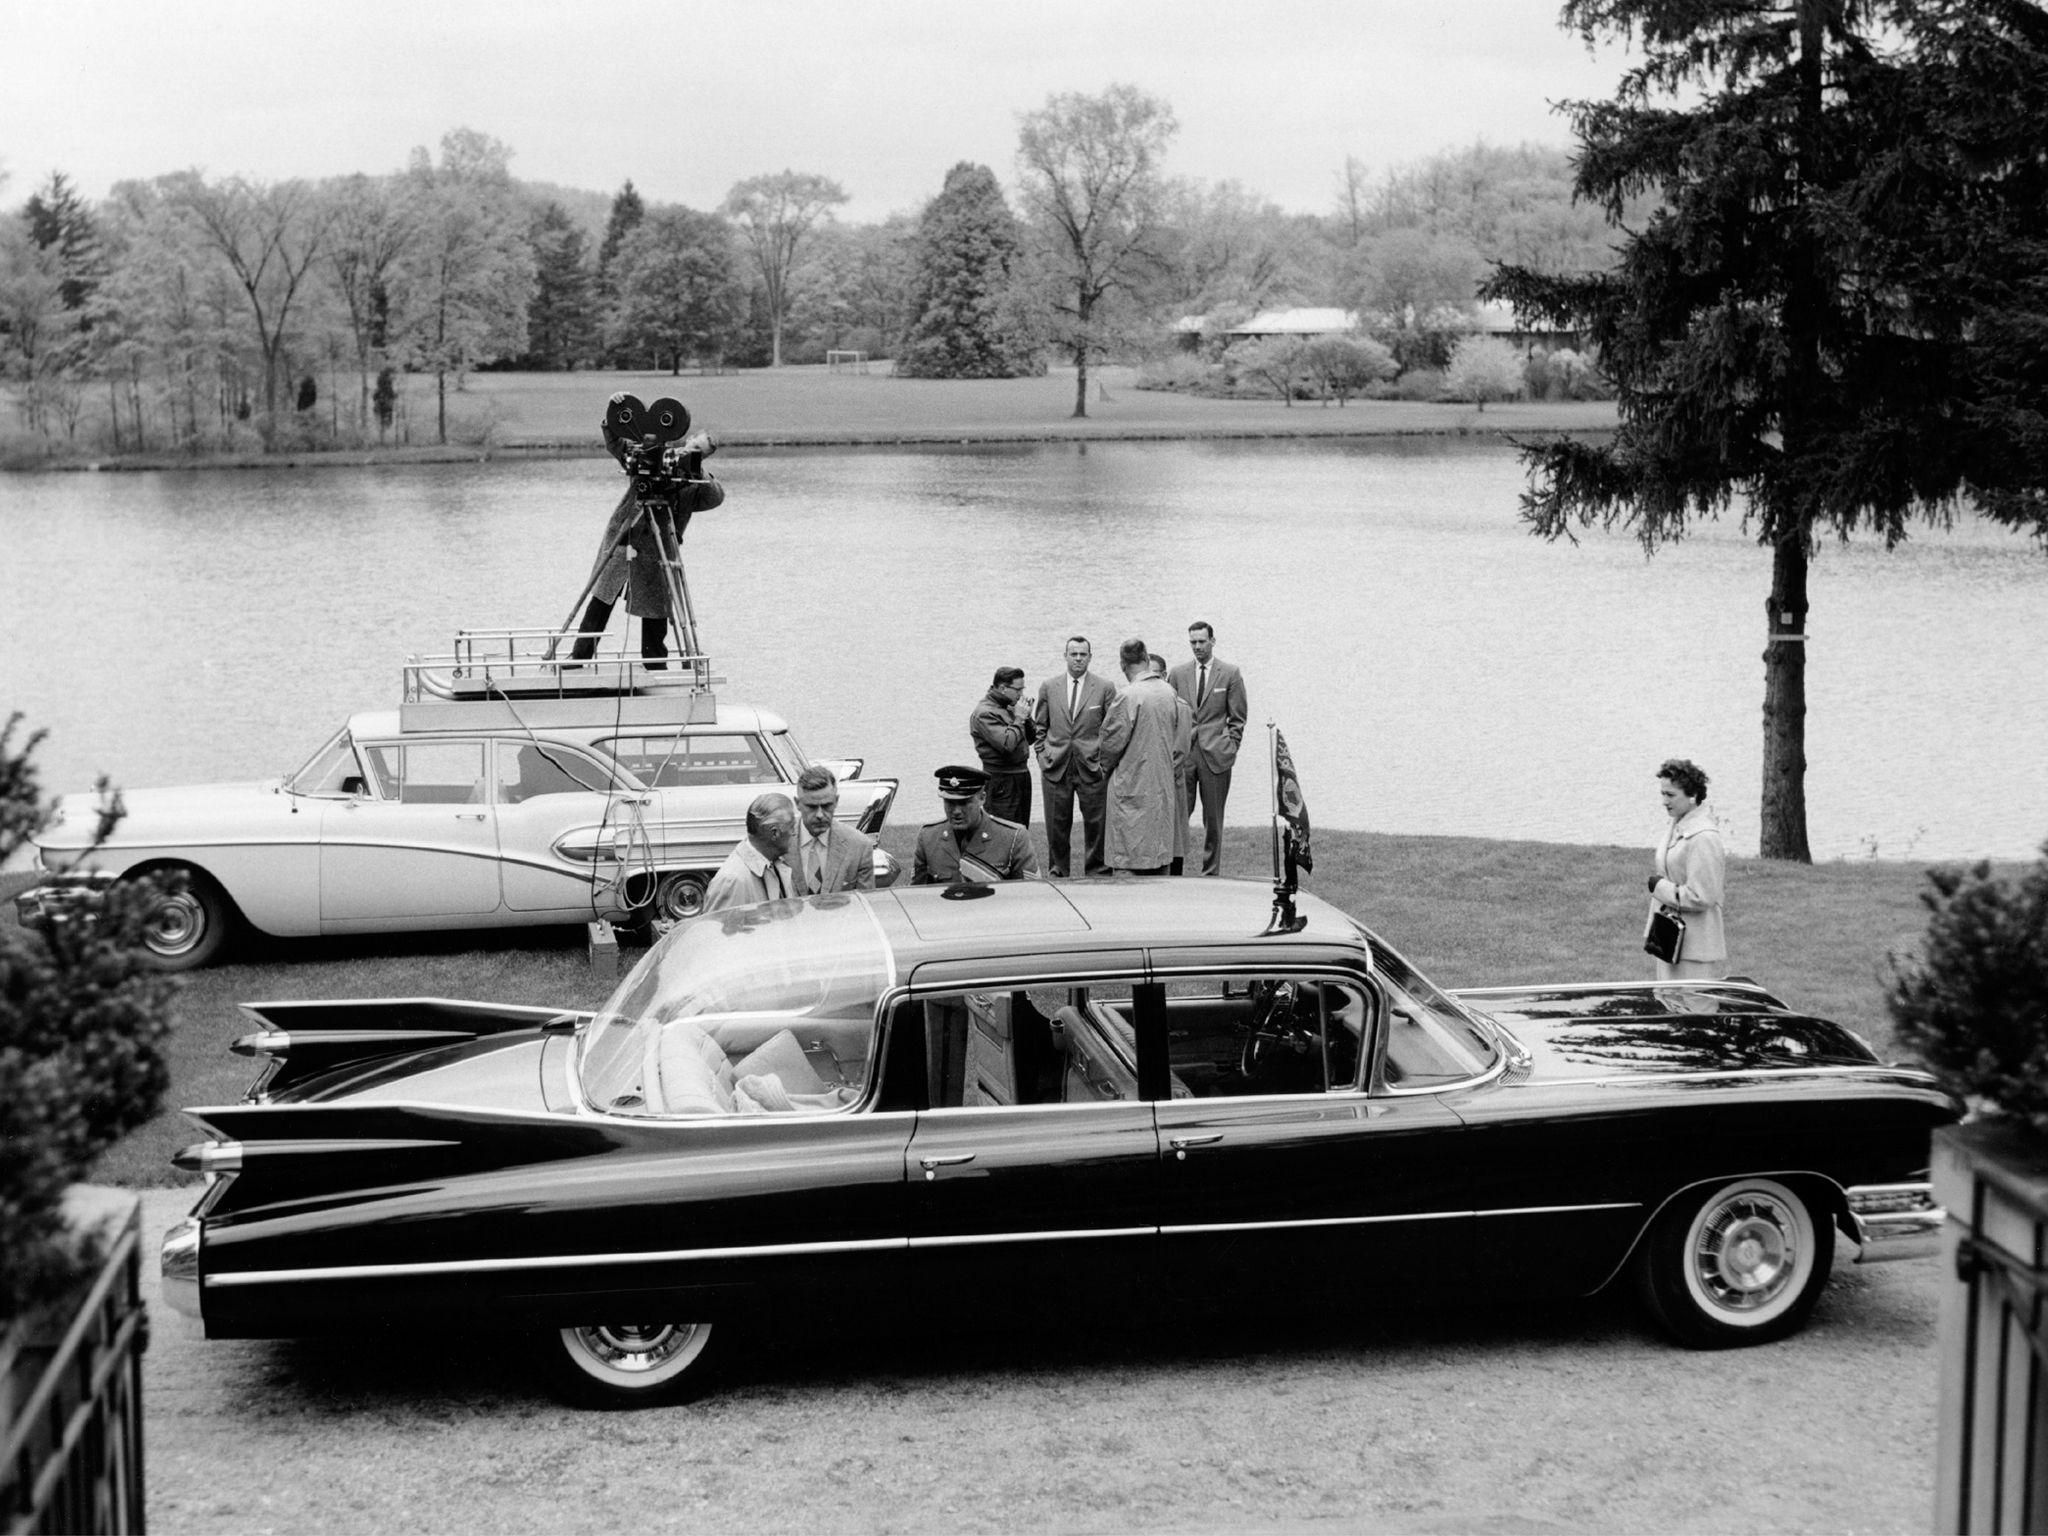 1959 cadillac fleetwood seventy five special limousine